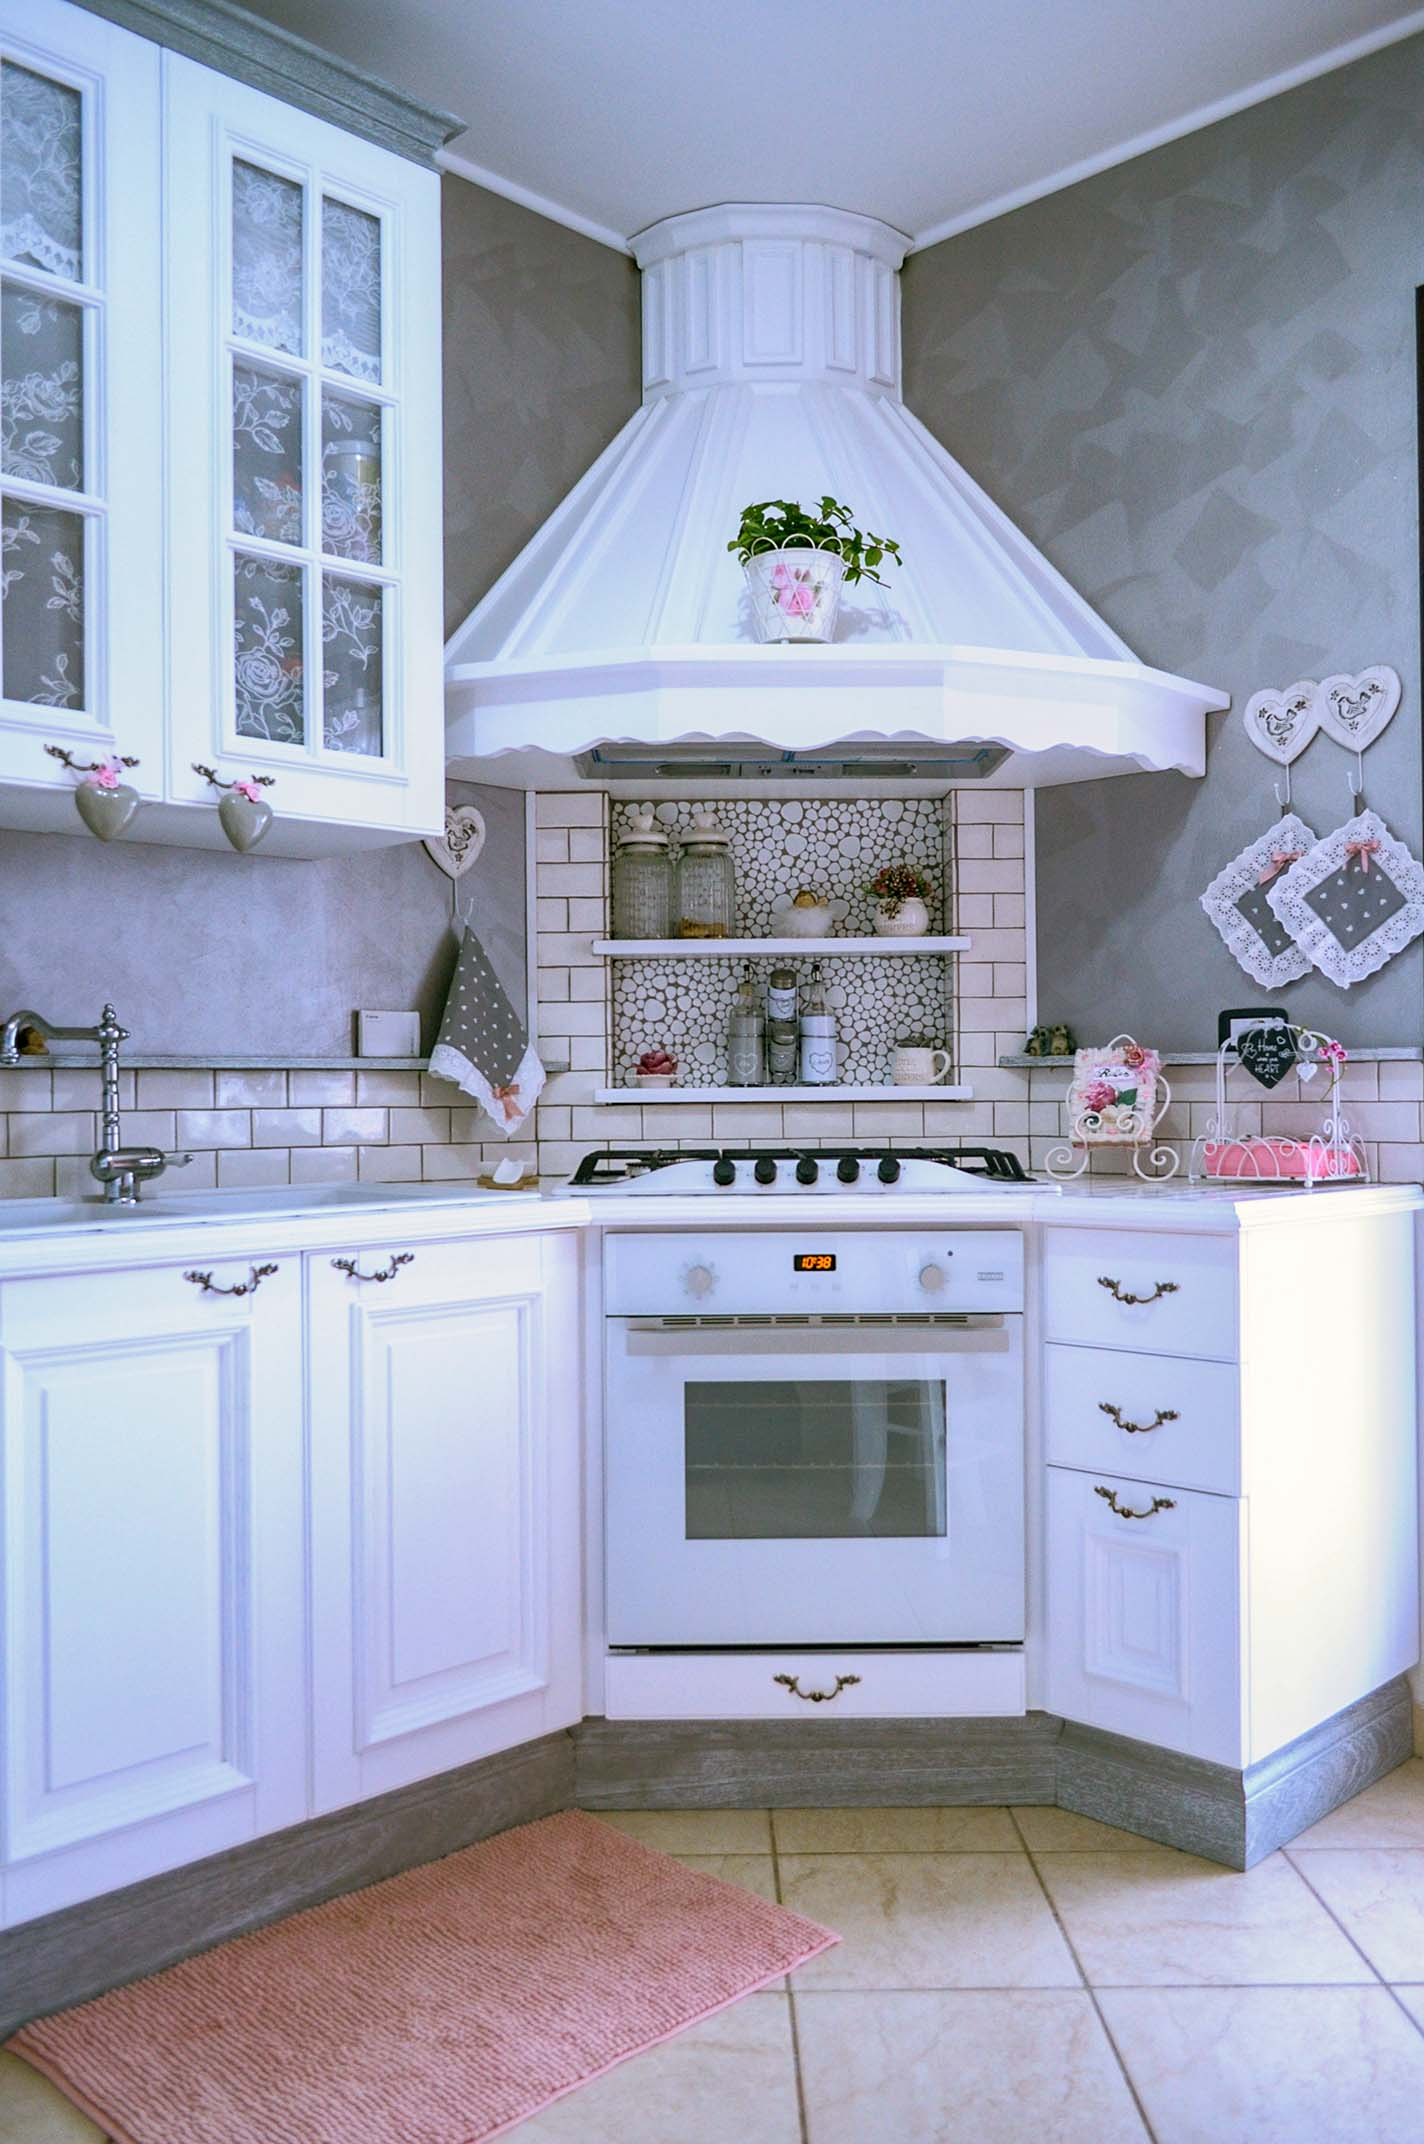 2-cucina shabby chic-su misura- cucina i